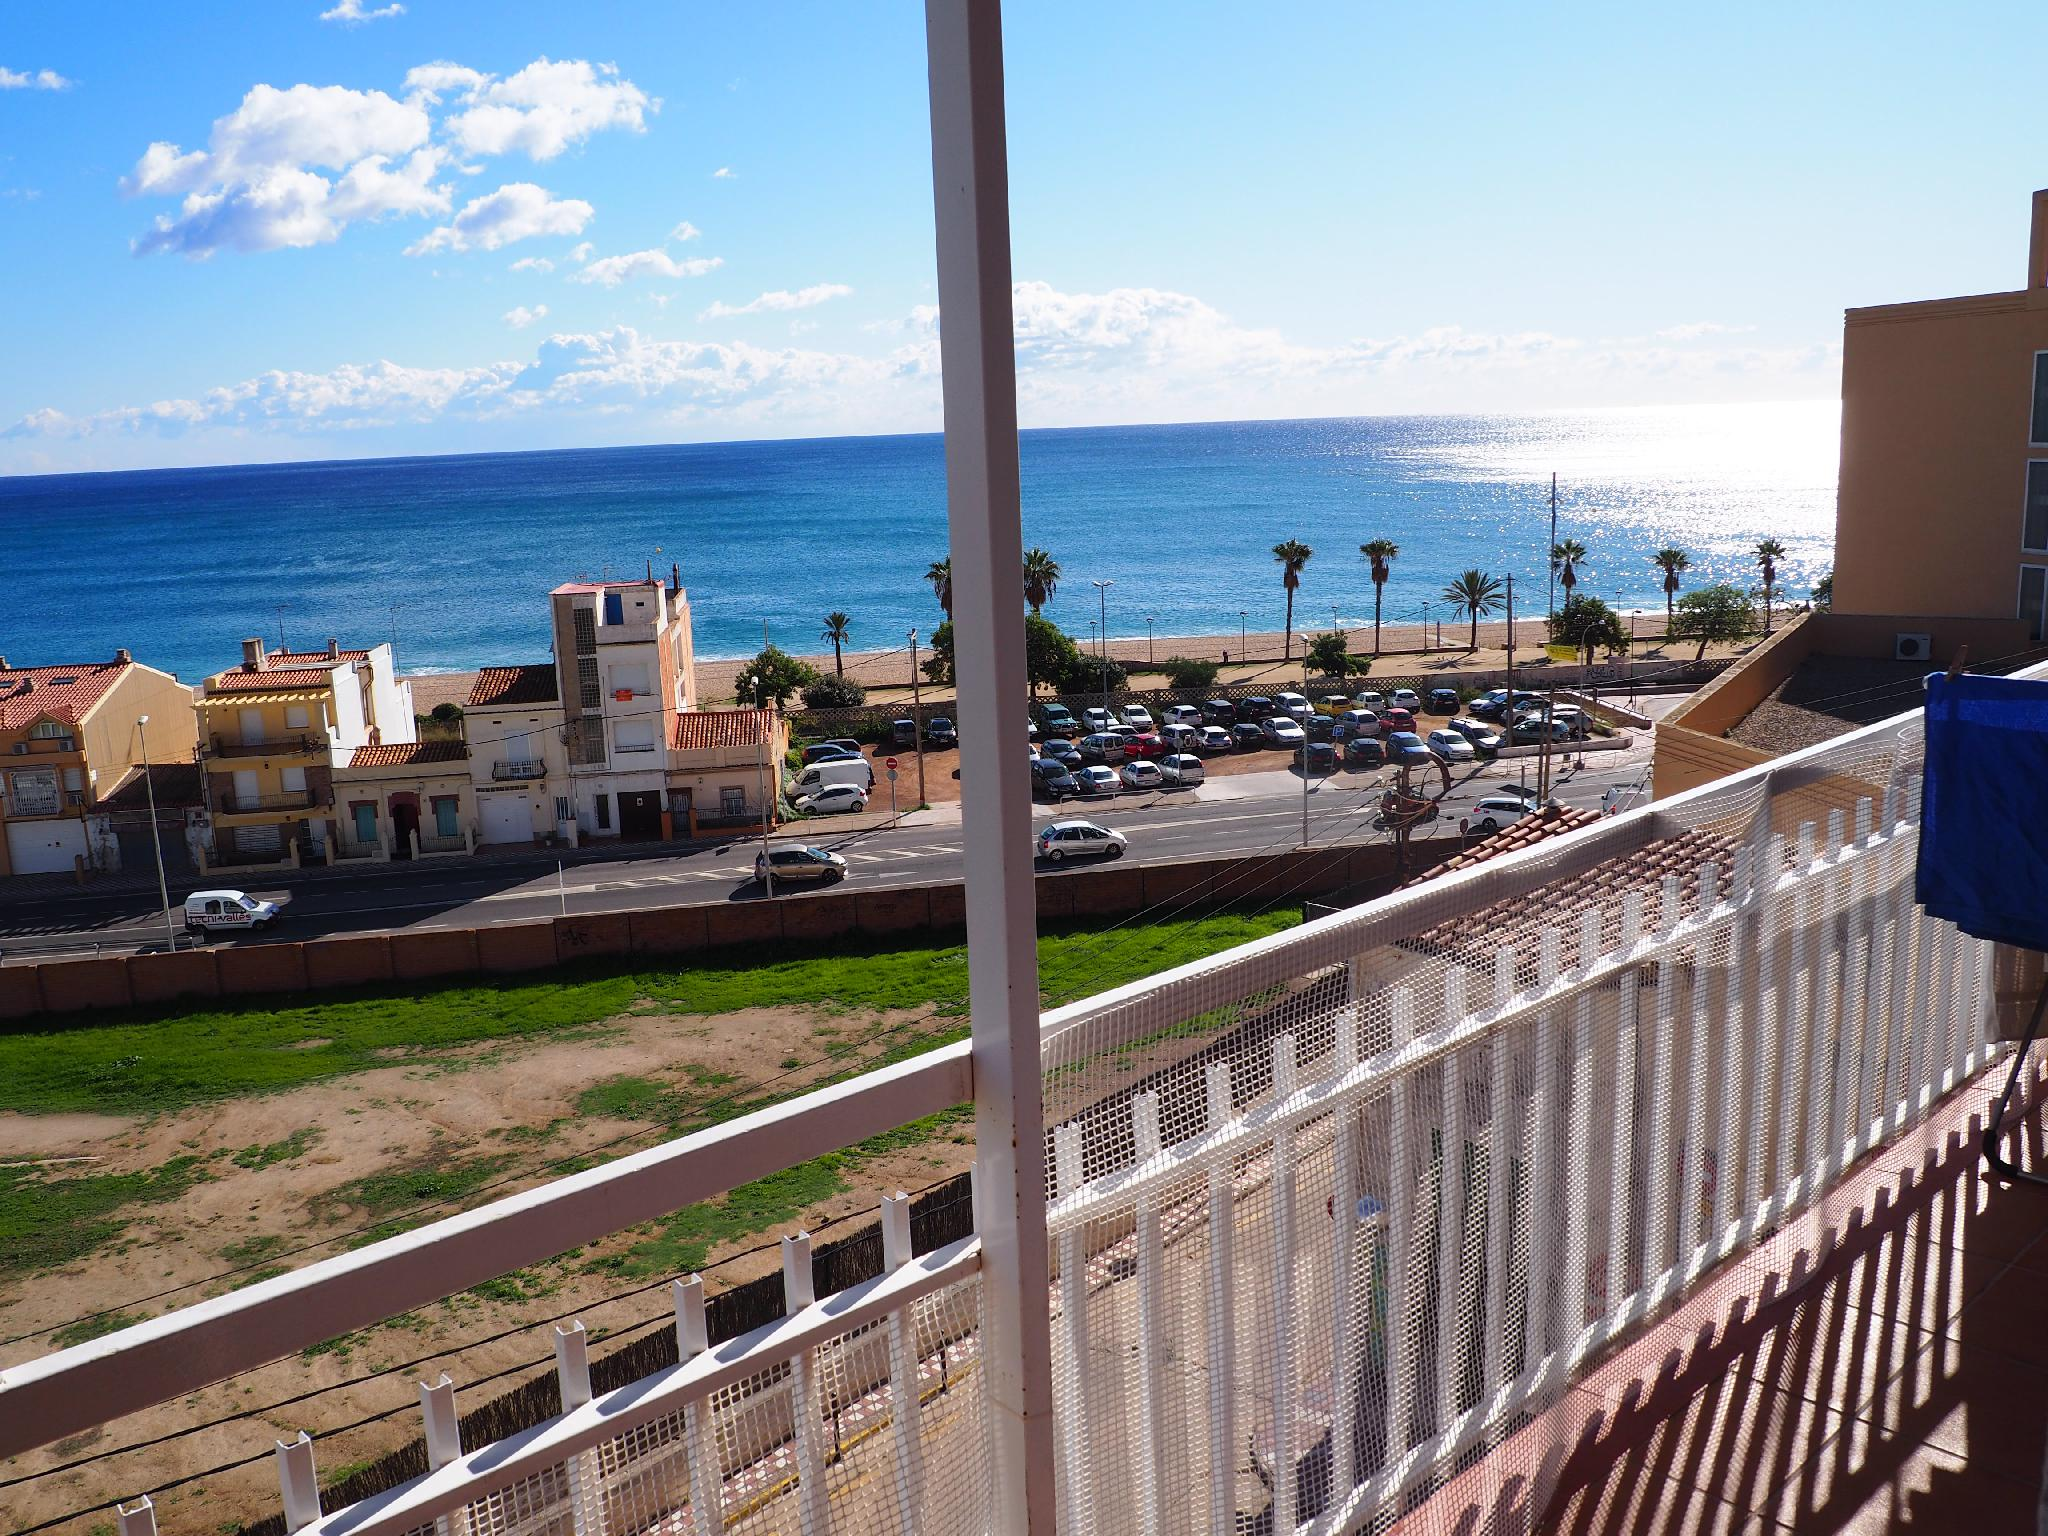 198307 - A pocos metros de la playa de Canet de Mar